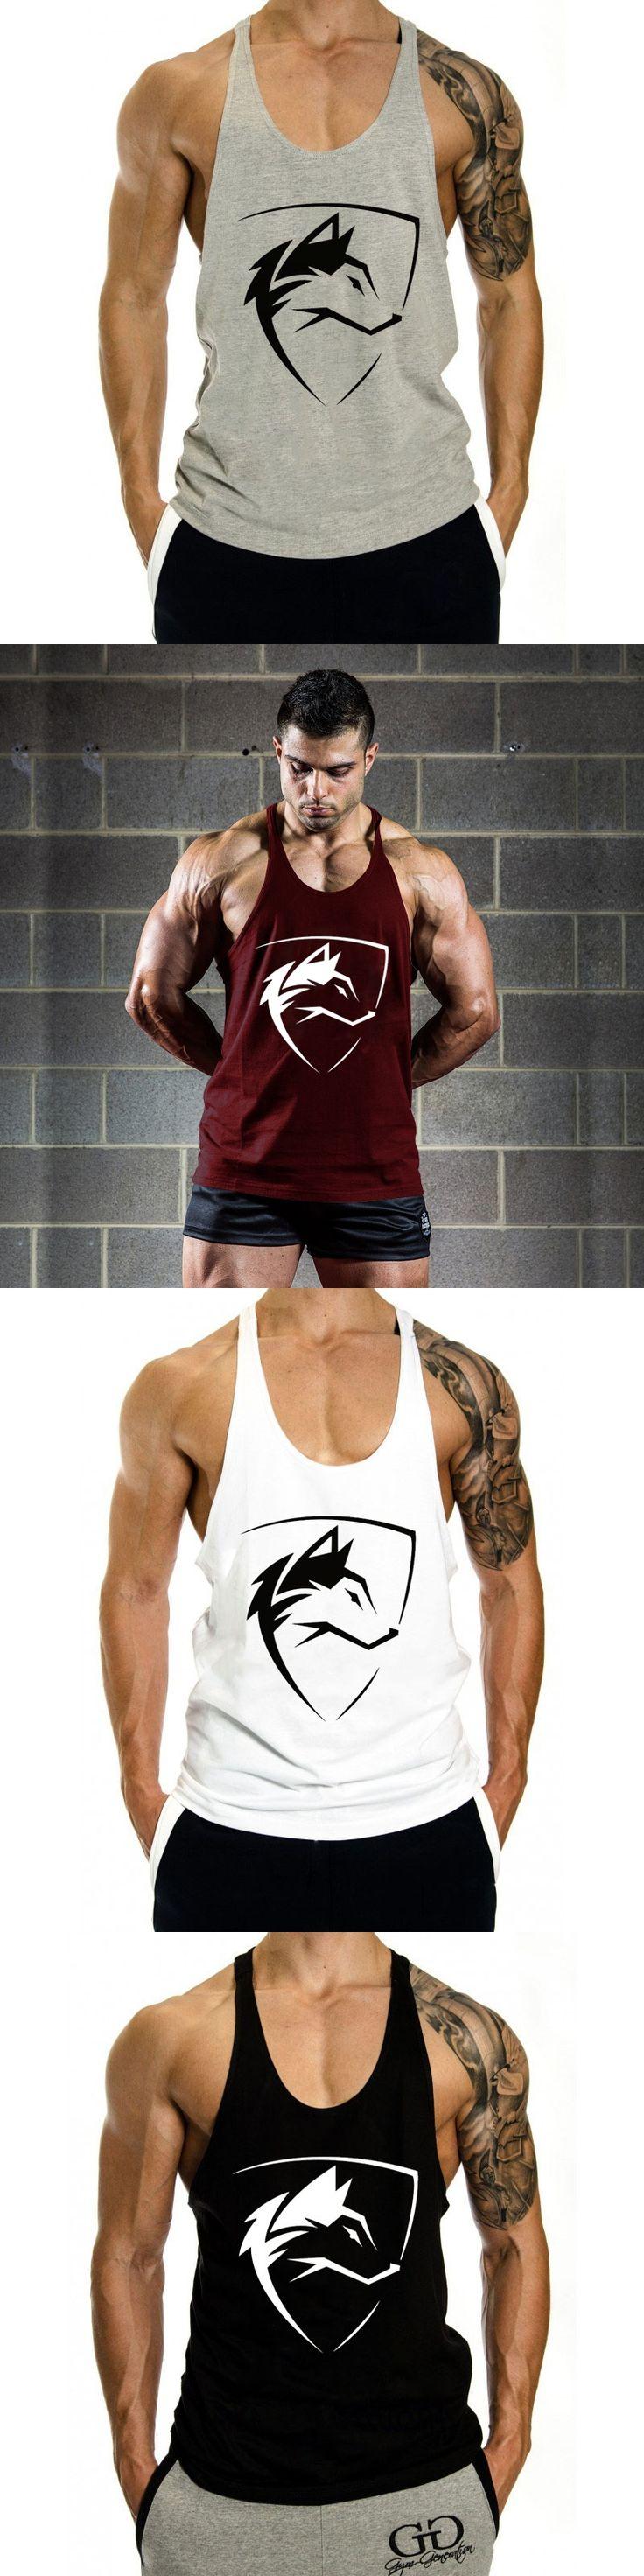 2017 Men Tank Tops Stringer Bodybuilding tank top gyms Fitness Men Vest Brand Clothing Sleeveless Shirts O-Neck tank top workout